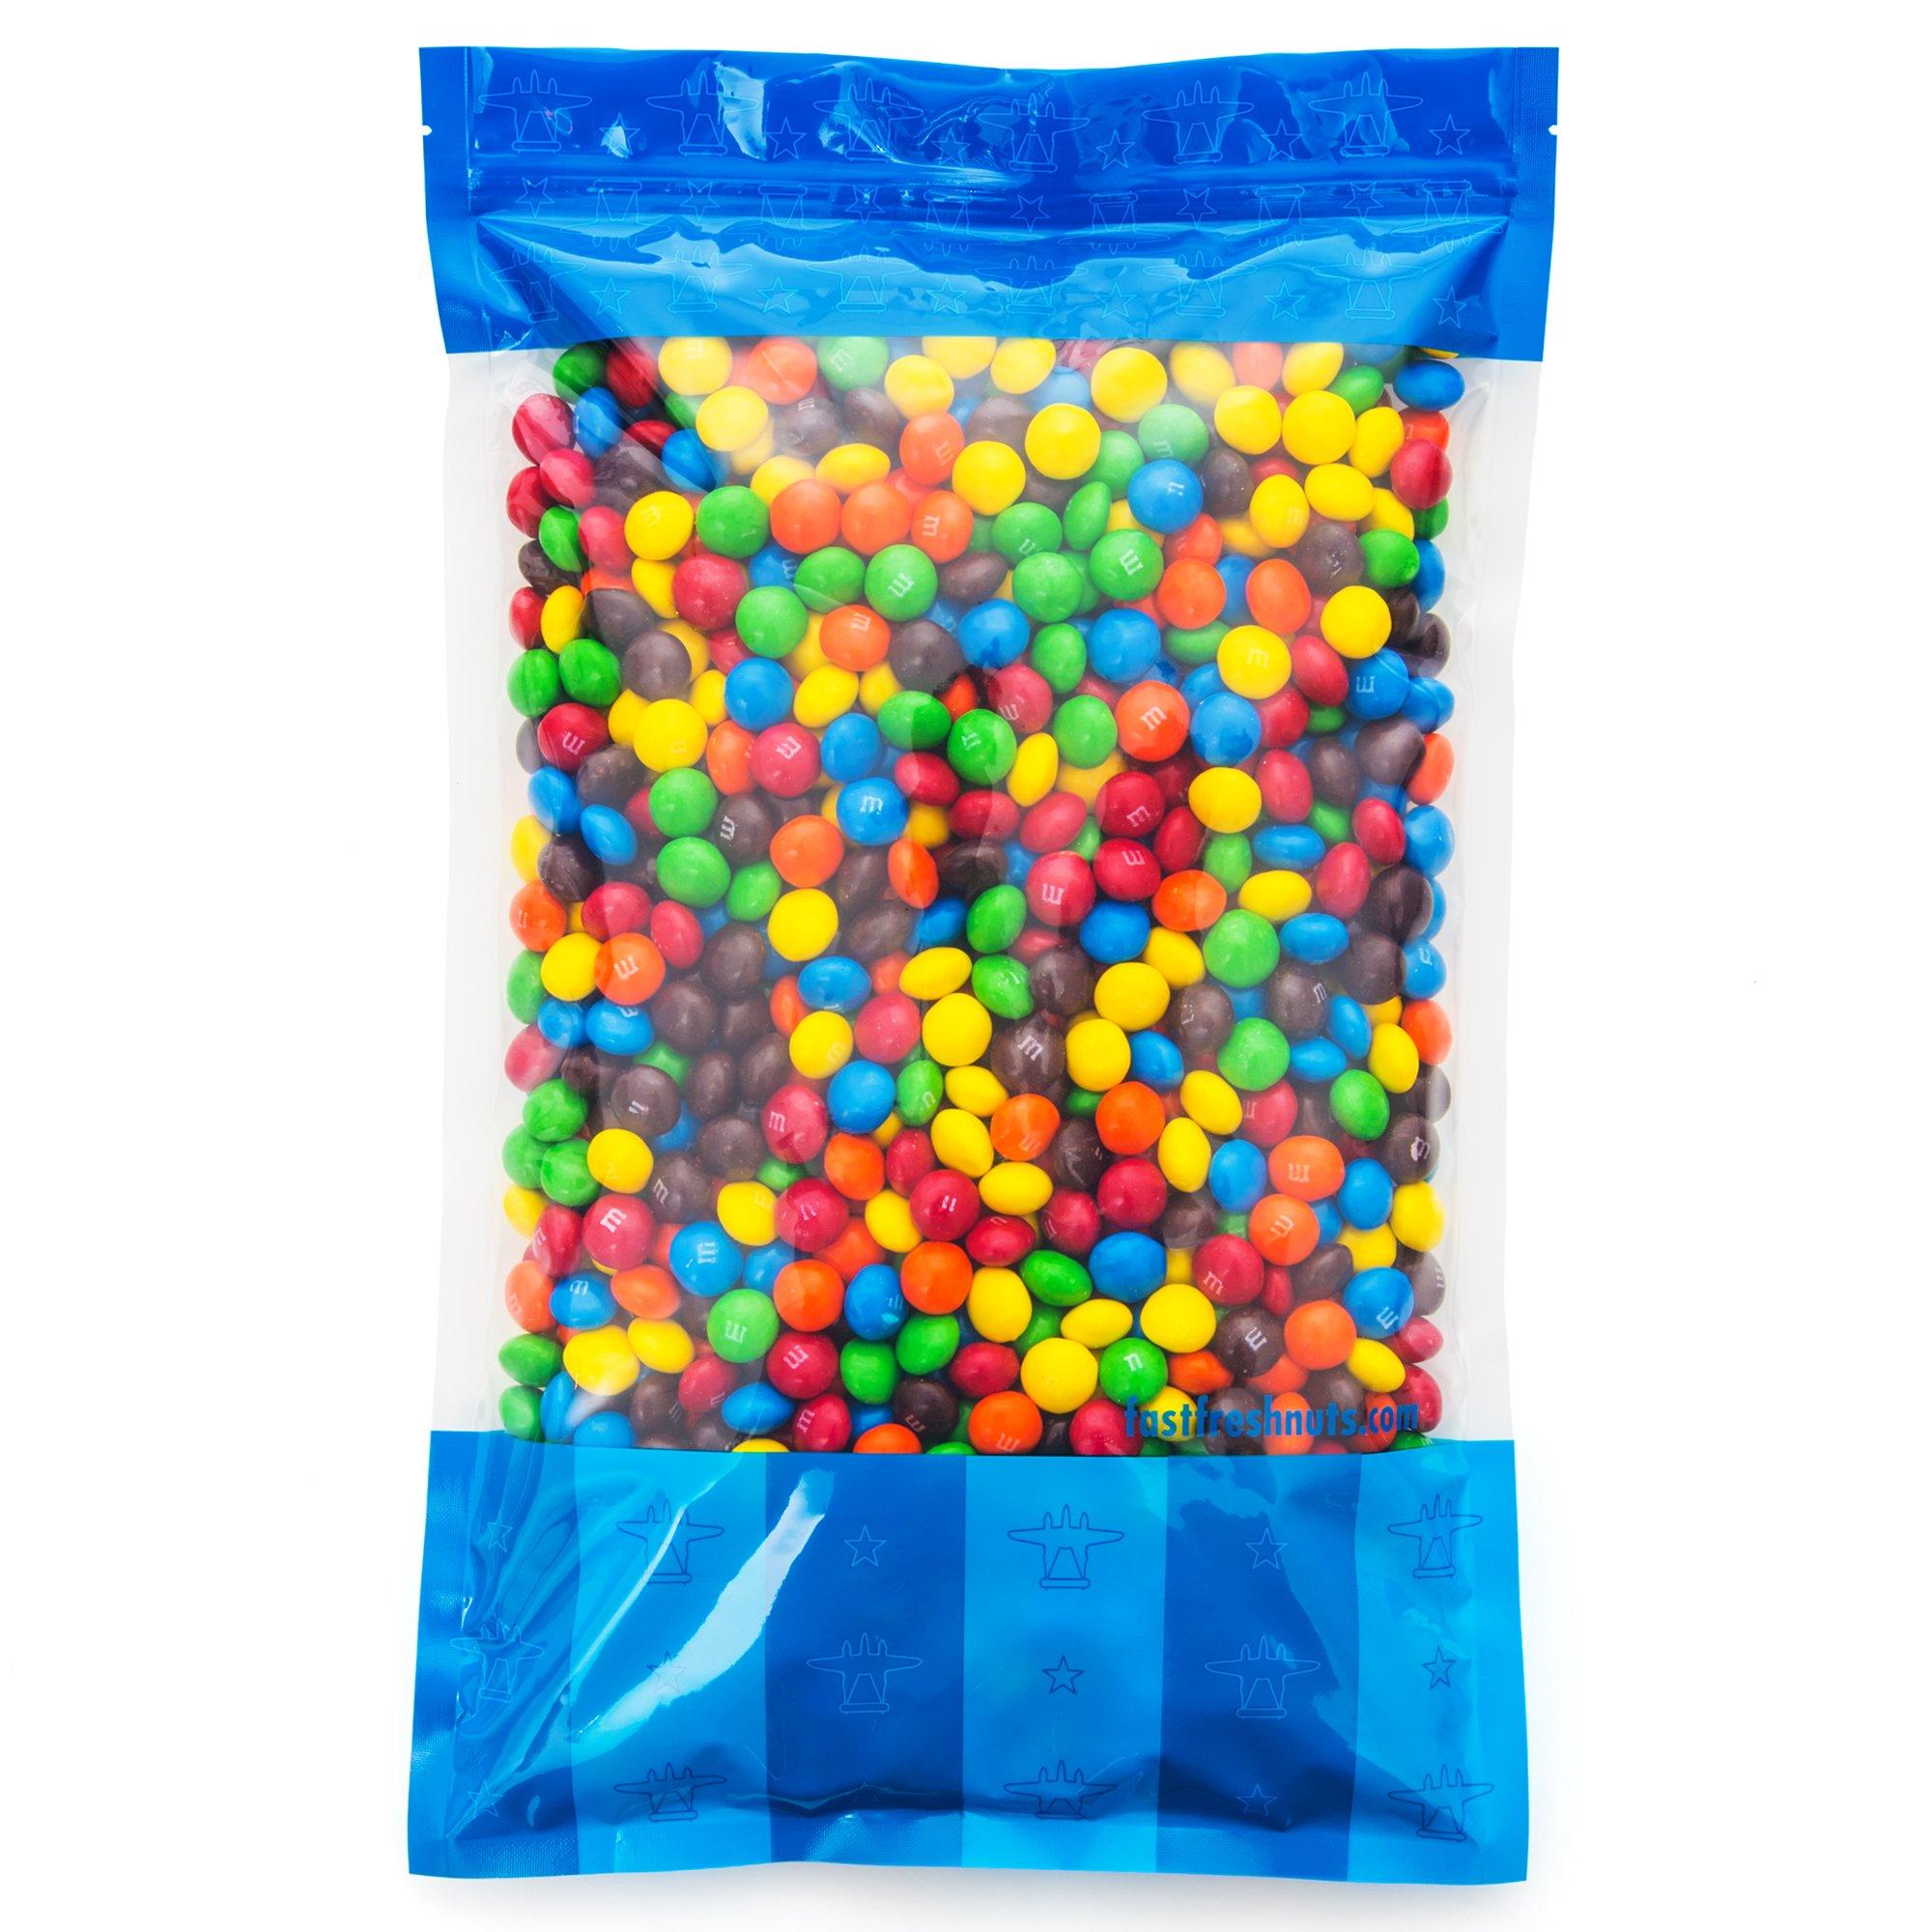 Bulk M&M's Plain Milk Chocolate in a Bomber® Bag - 5 lbs - Fresh, Tasty Treats - Resealable Bag